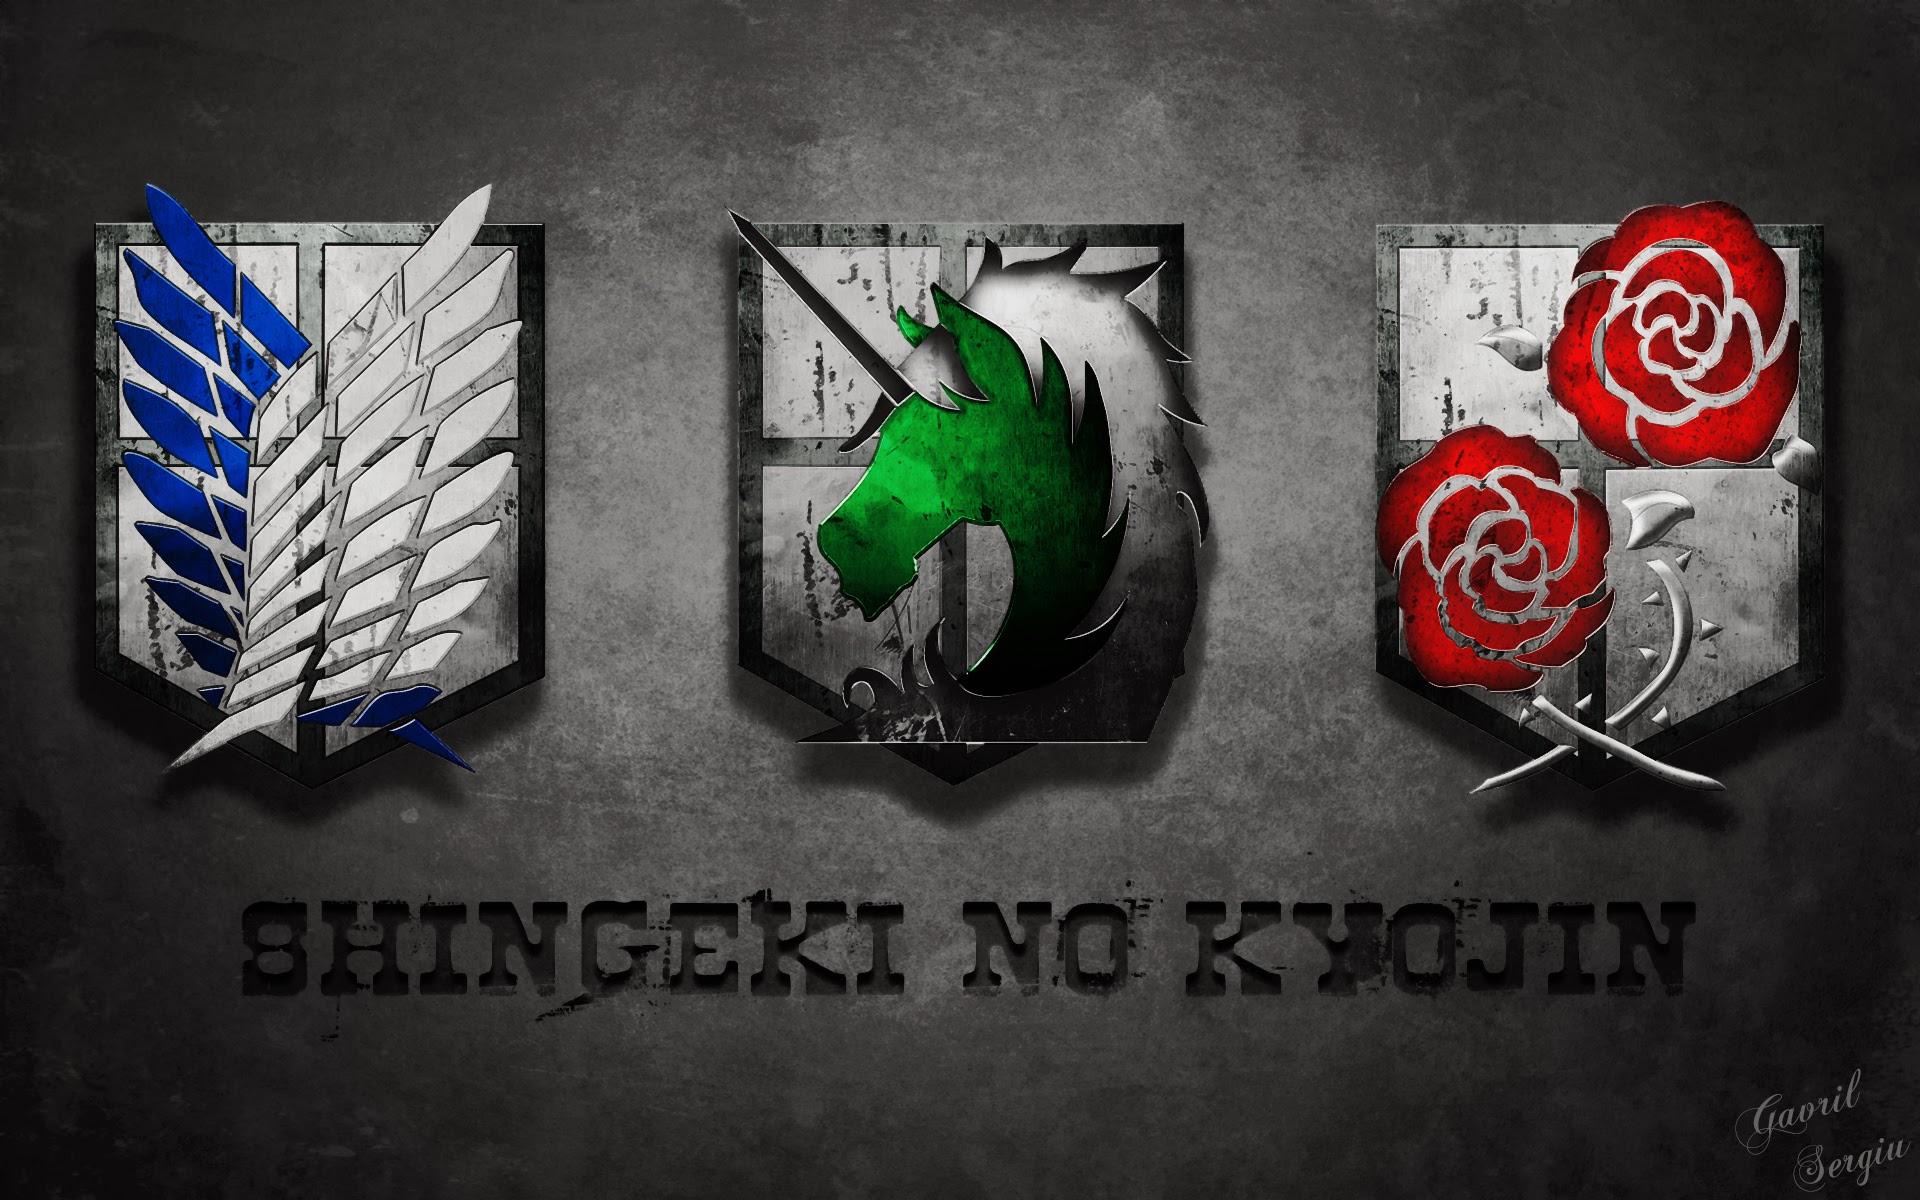 attack on titan emblem flag logo shingeki no kyojin anime hd wallpaper 1920x1200